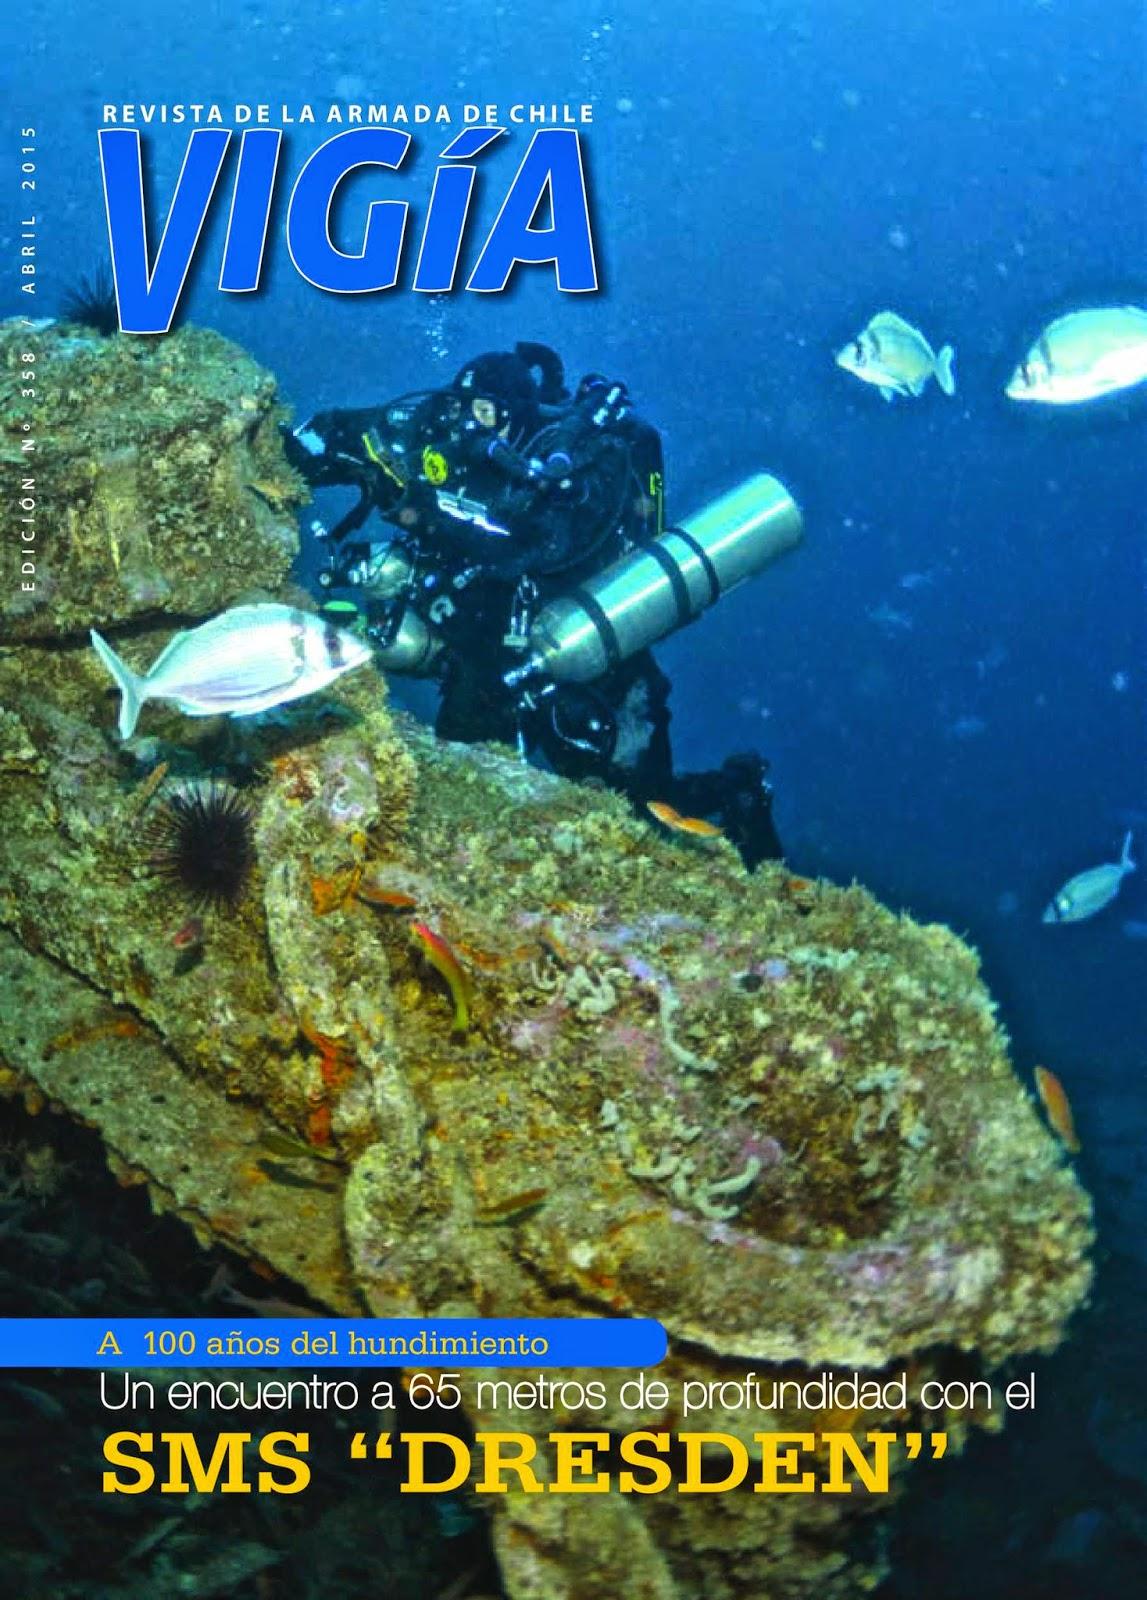 http://www.revistavigia.cl/papeldigital/indice.html?dr=revistavigia&edic=20150413&mp=36